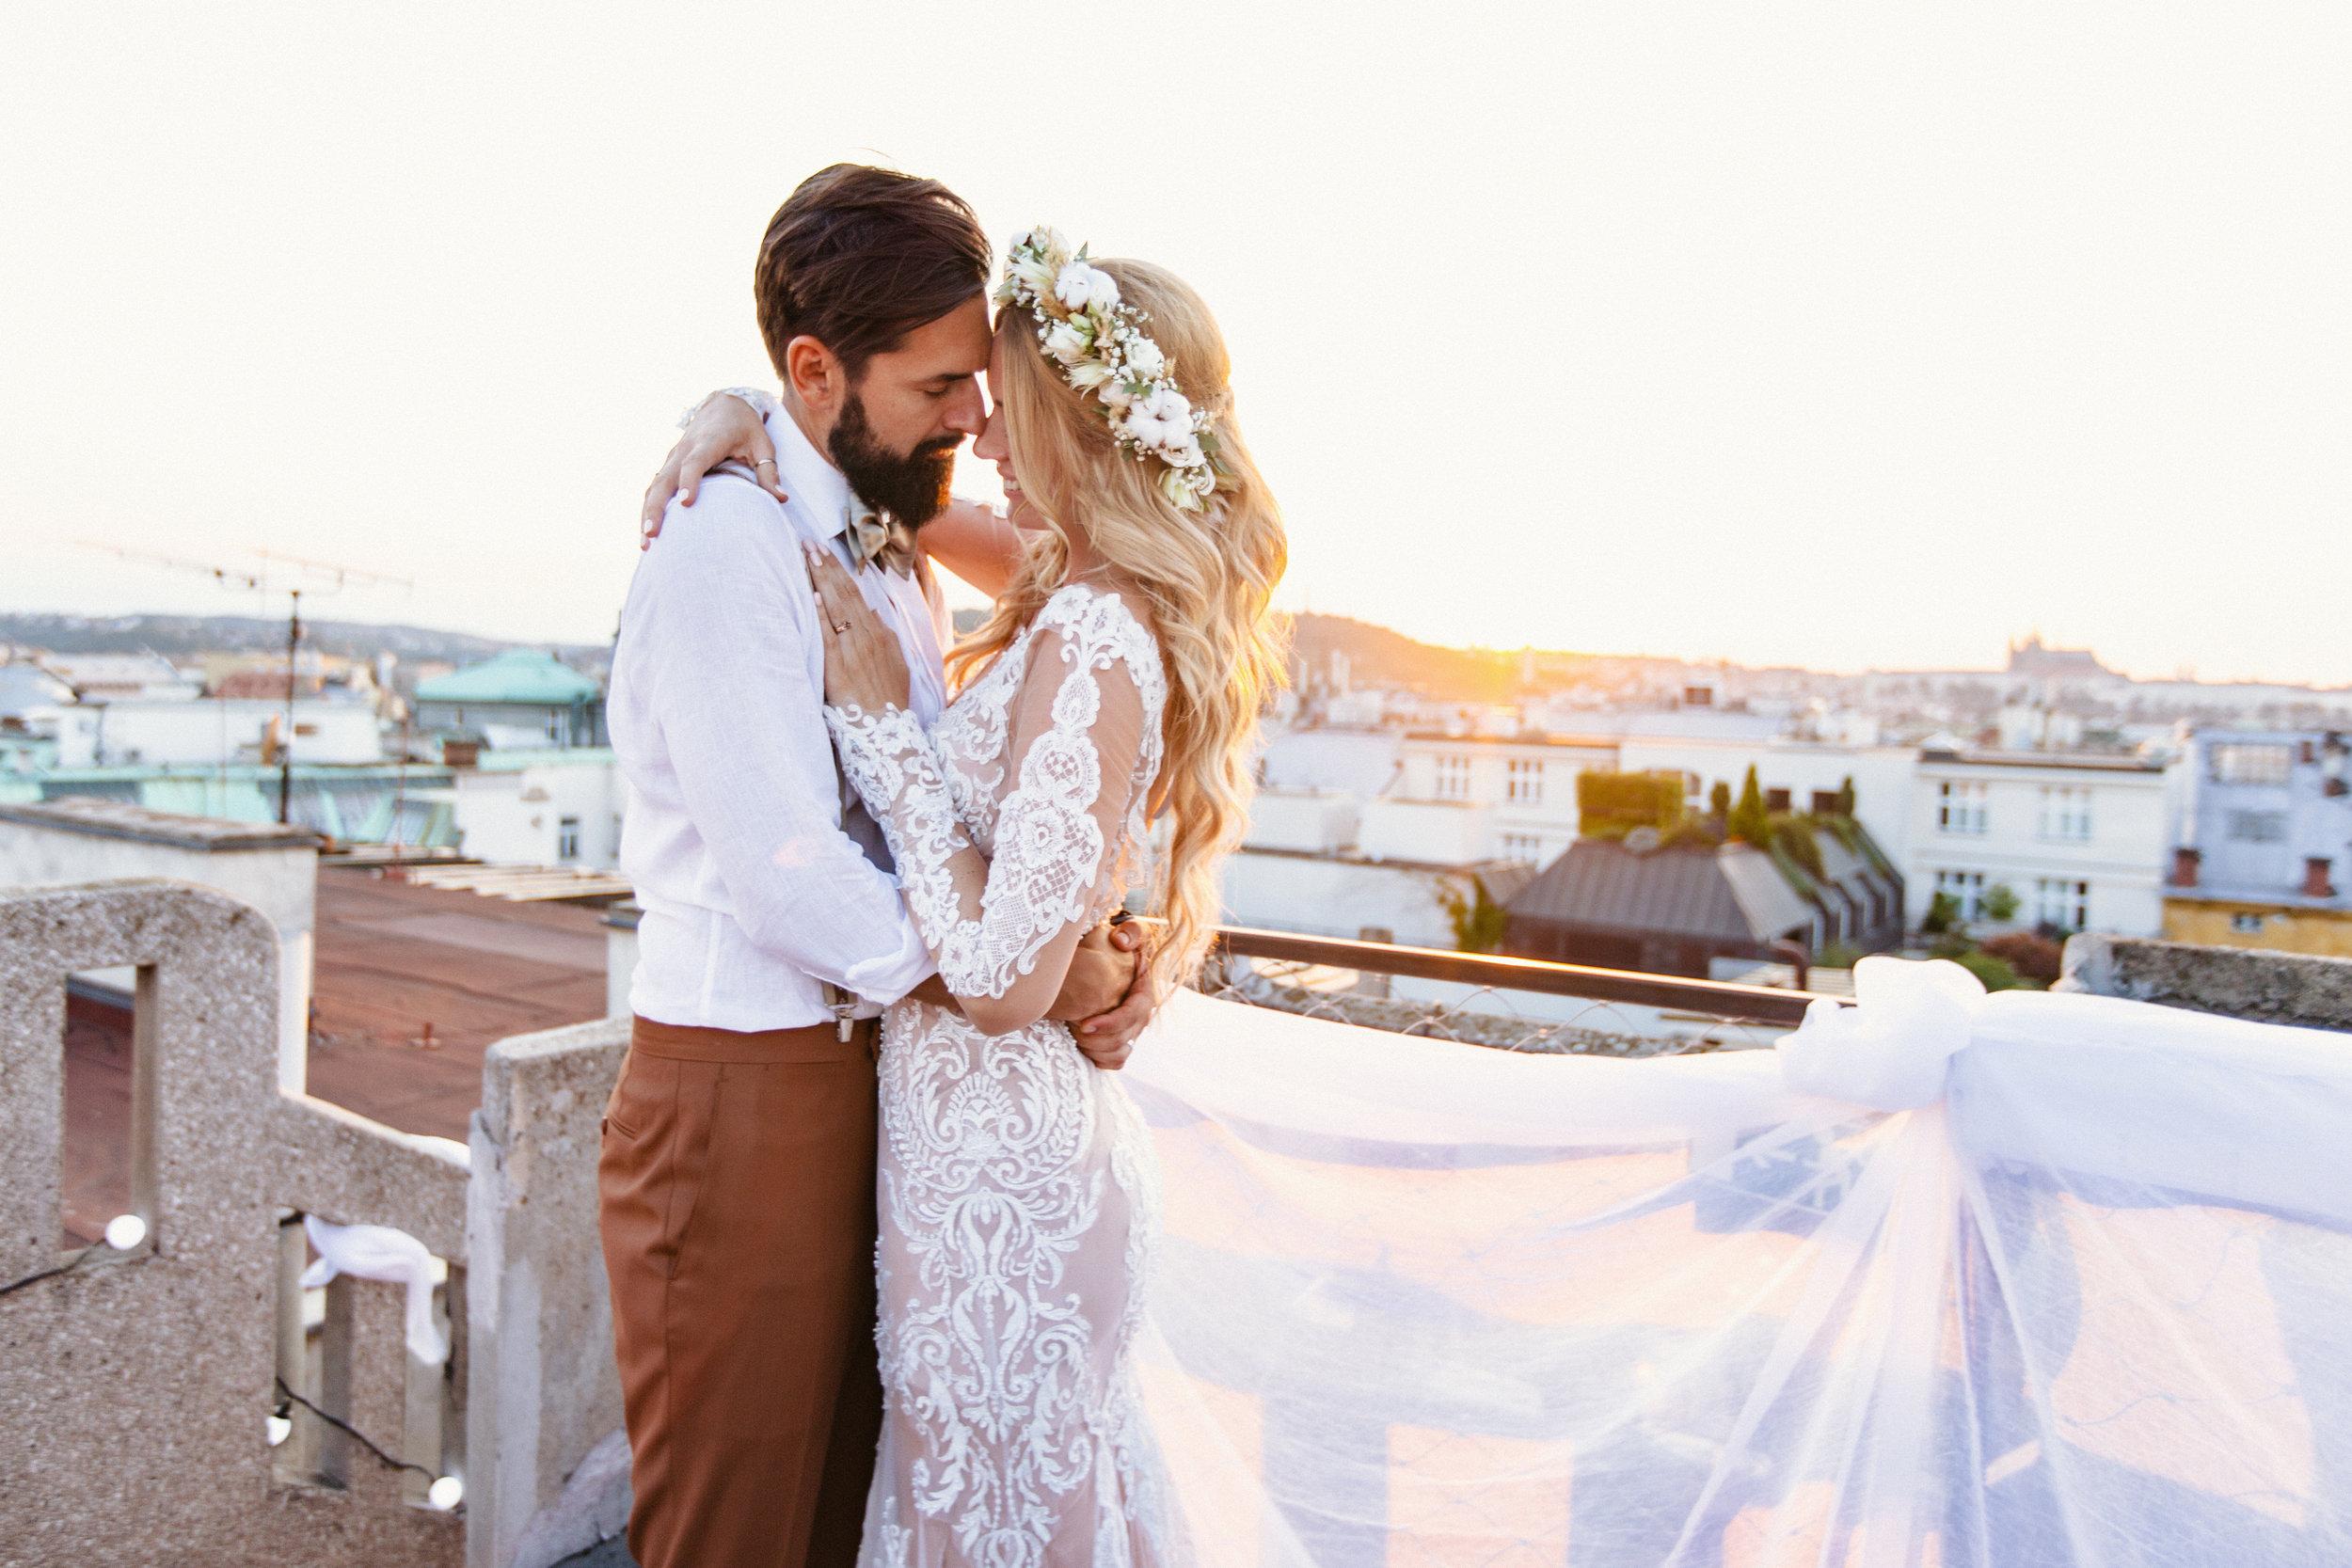 Photo by Anna Konieva - wedding photographer.